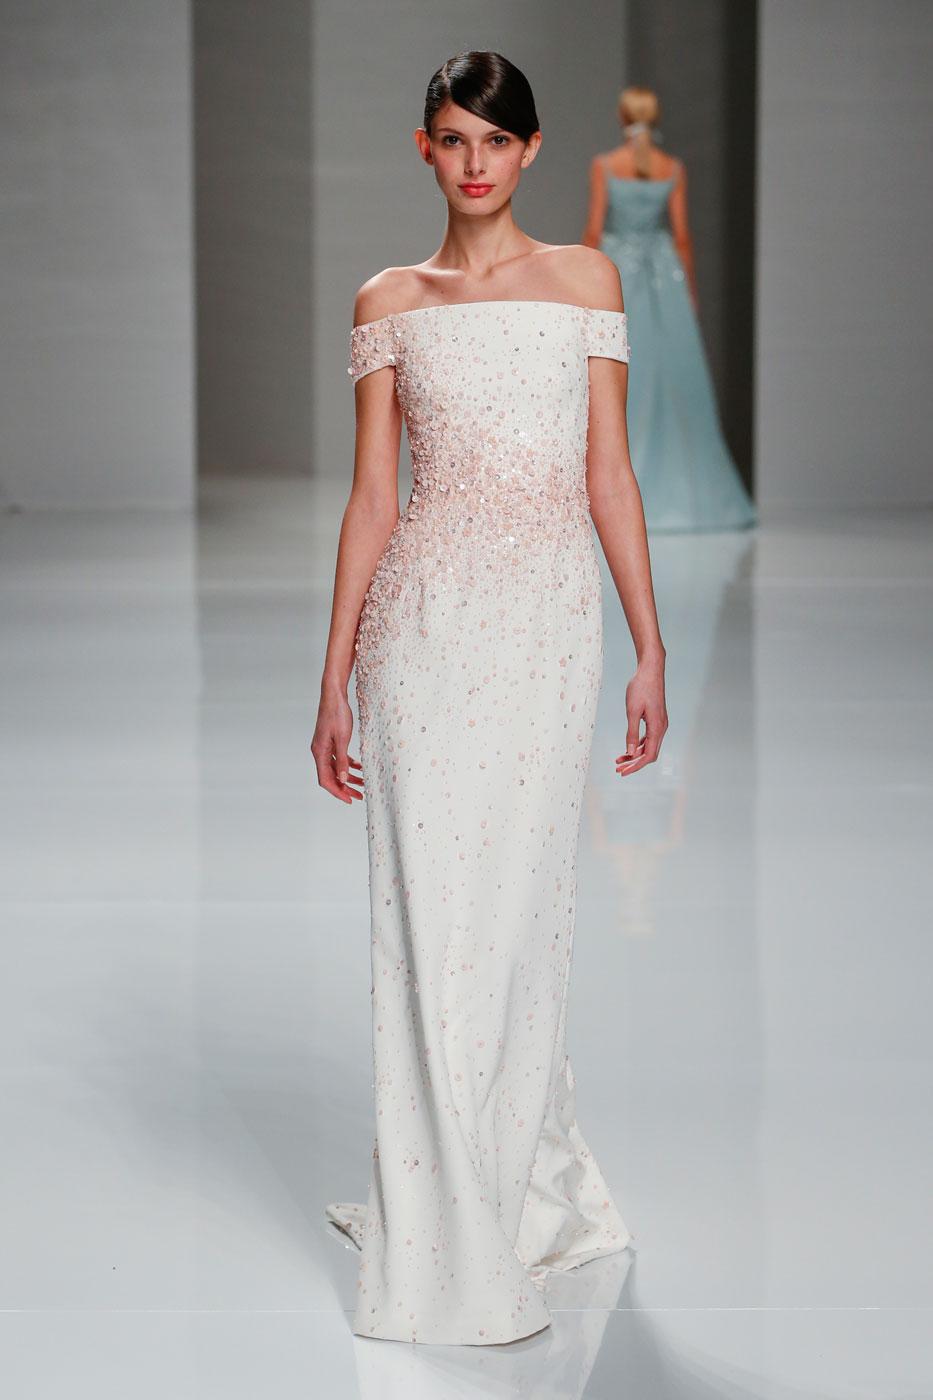 Georges-Hobeika-fashion-runway-show-haute-couture-paris-spring-2015-the-impression-47